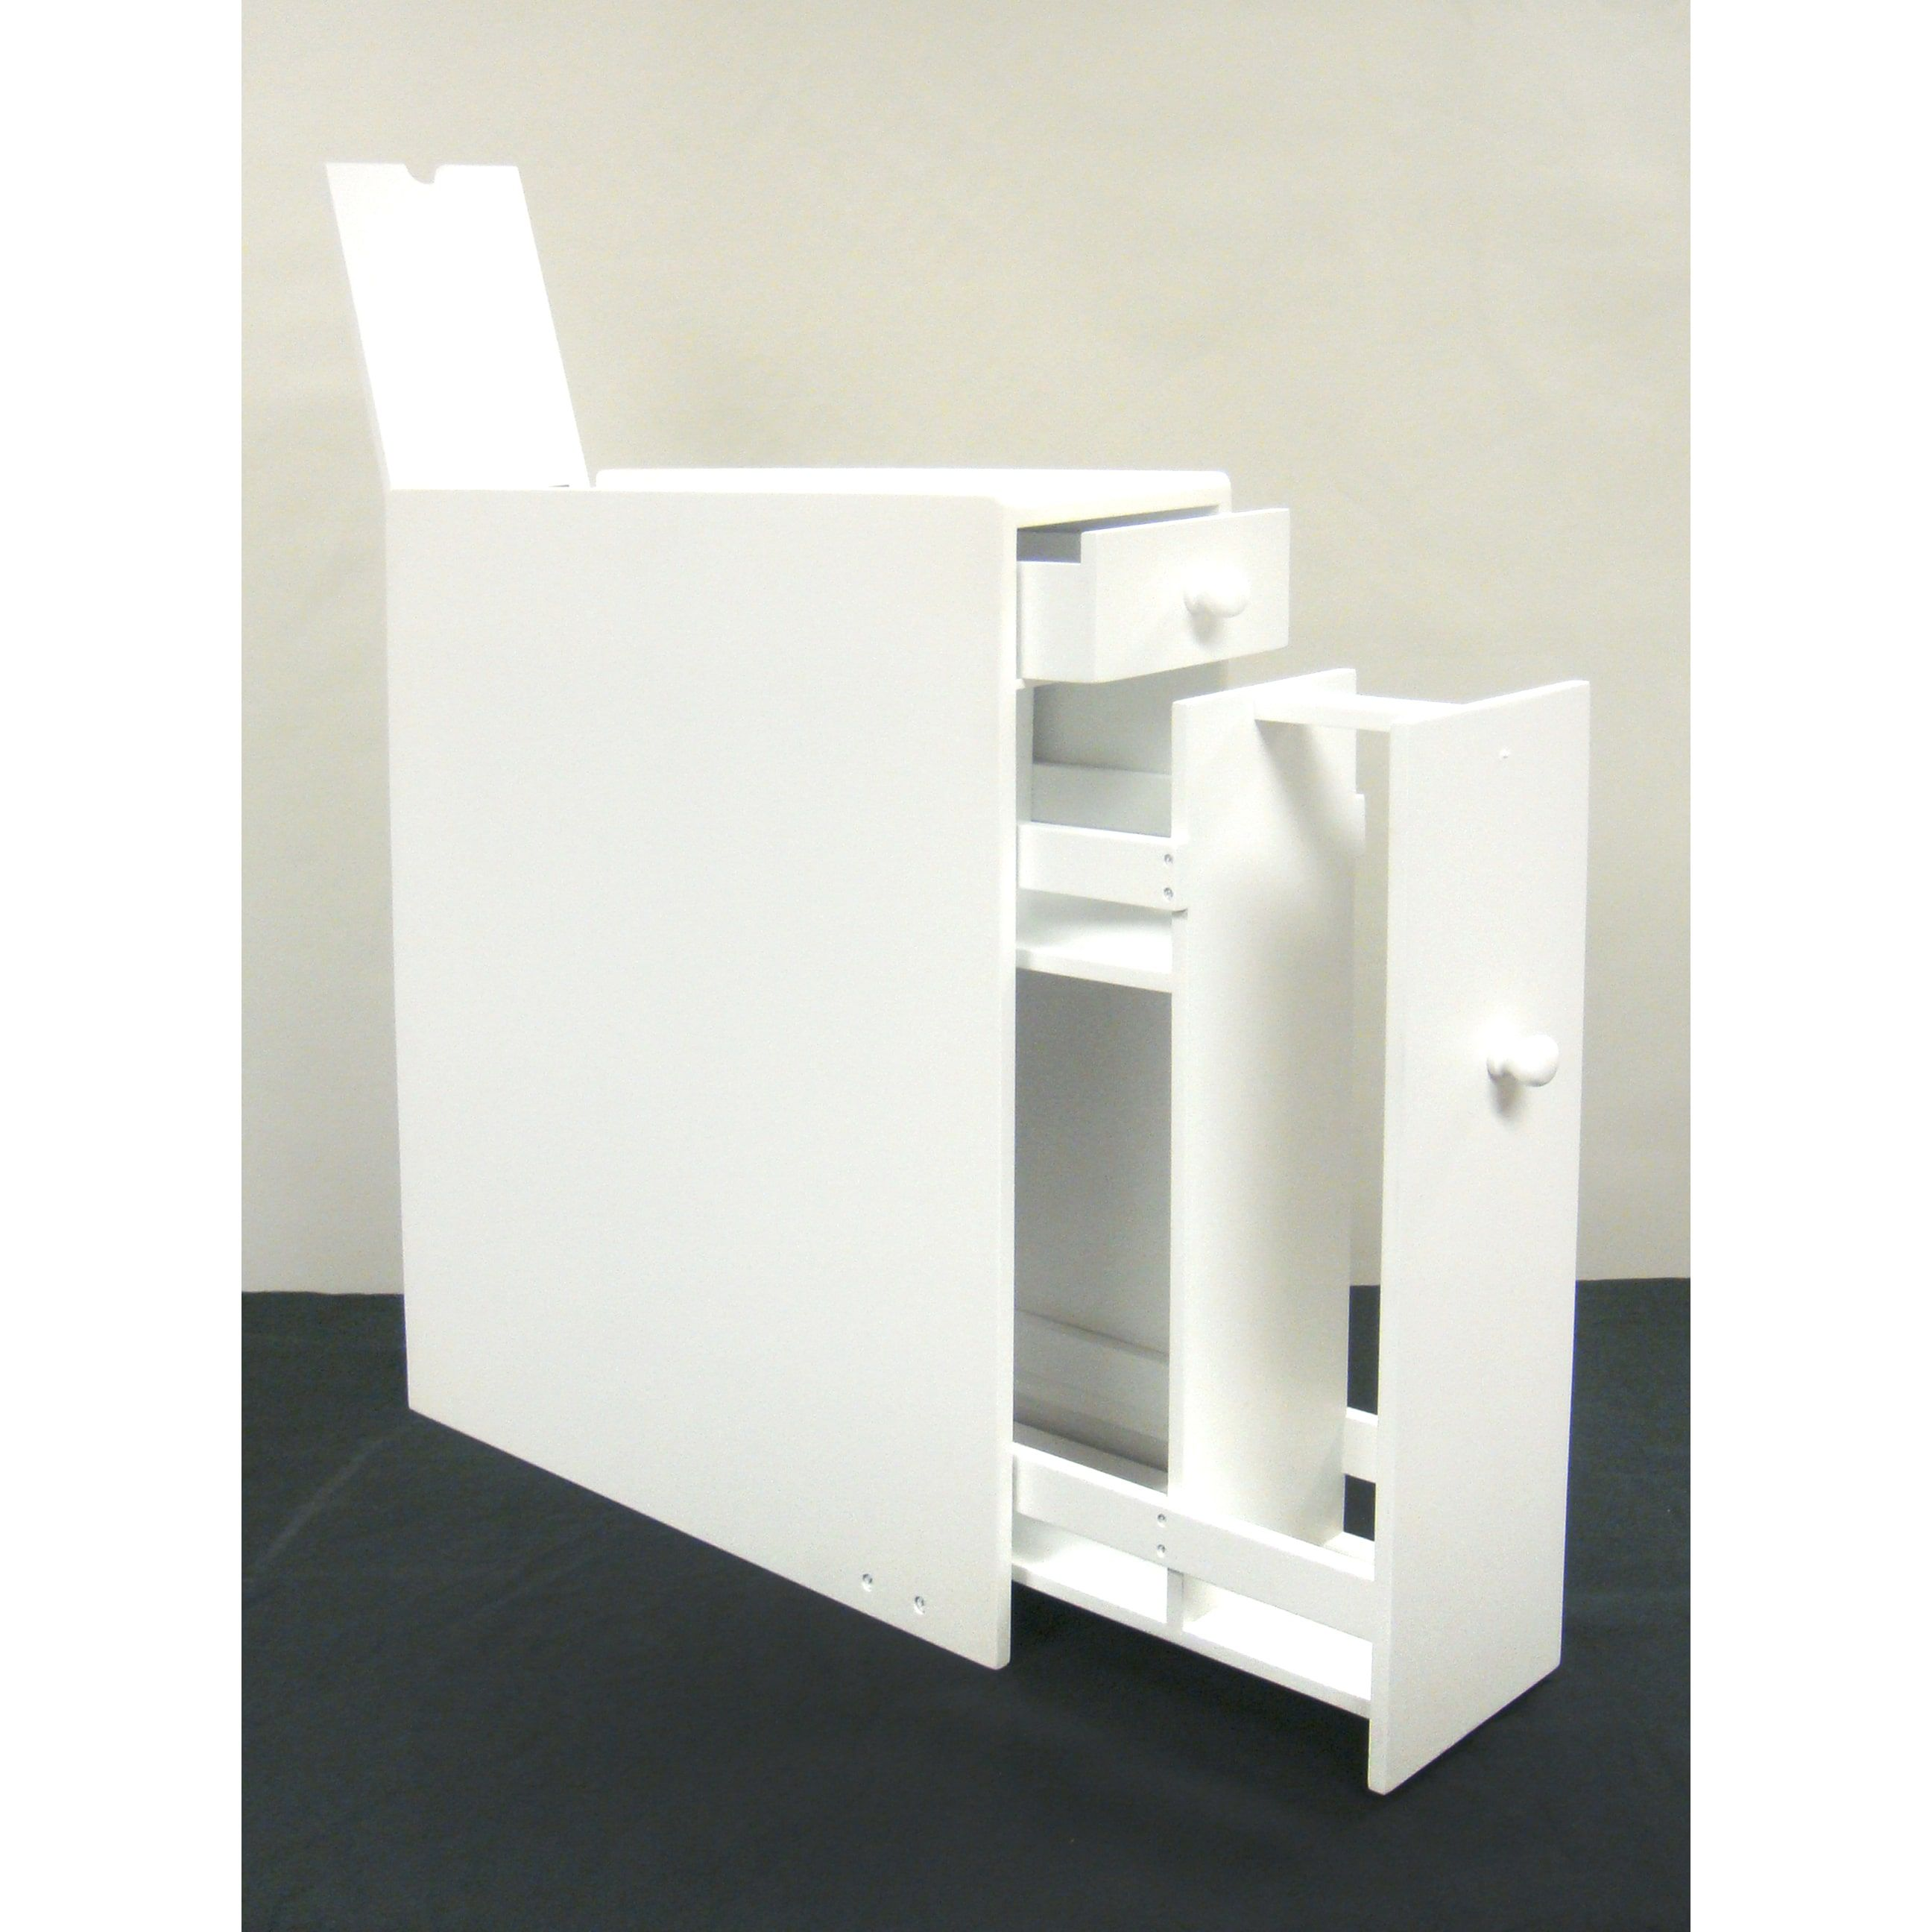 Proman Products Bathroom Floor Cabinet Bathroom Floor Cabinets Small Bathroom Storage Bathroom Interior